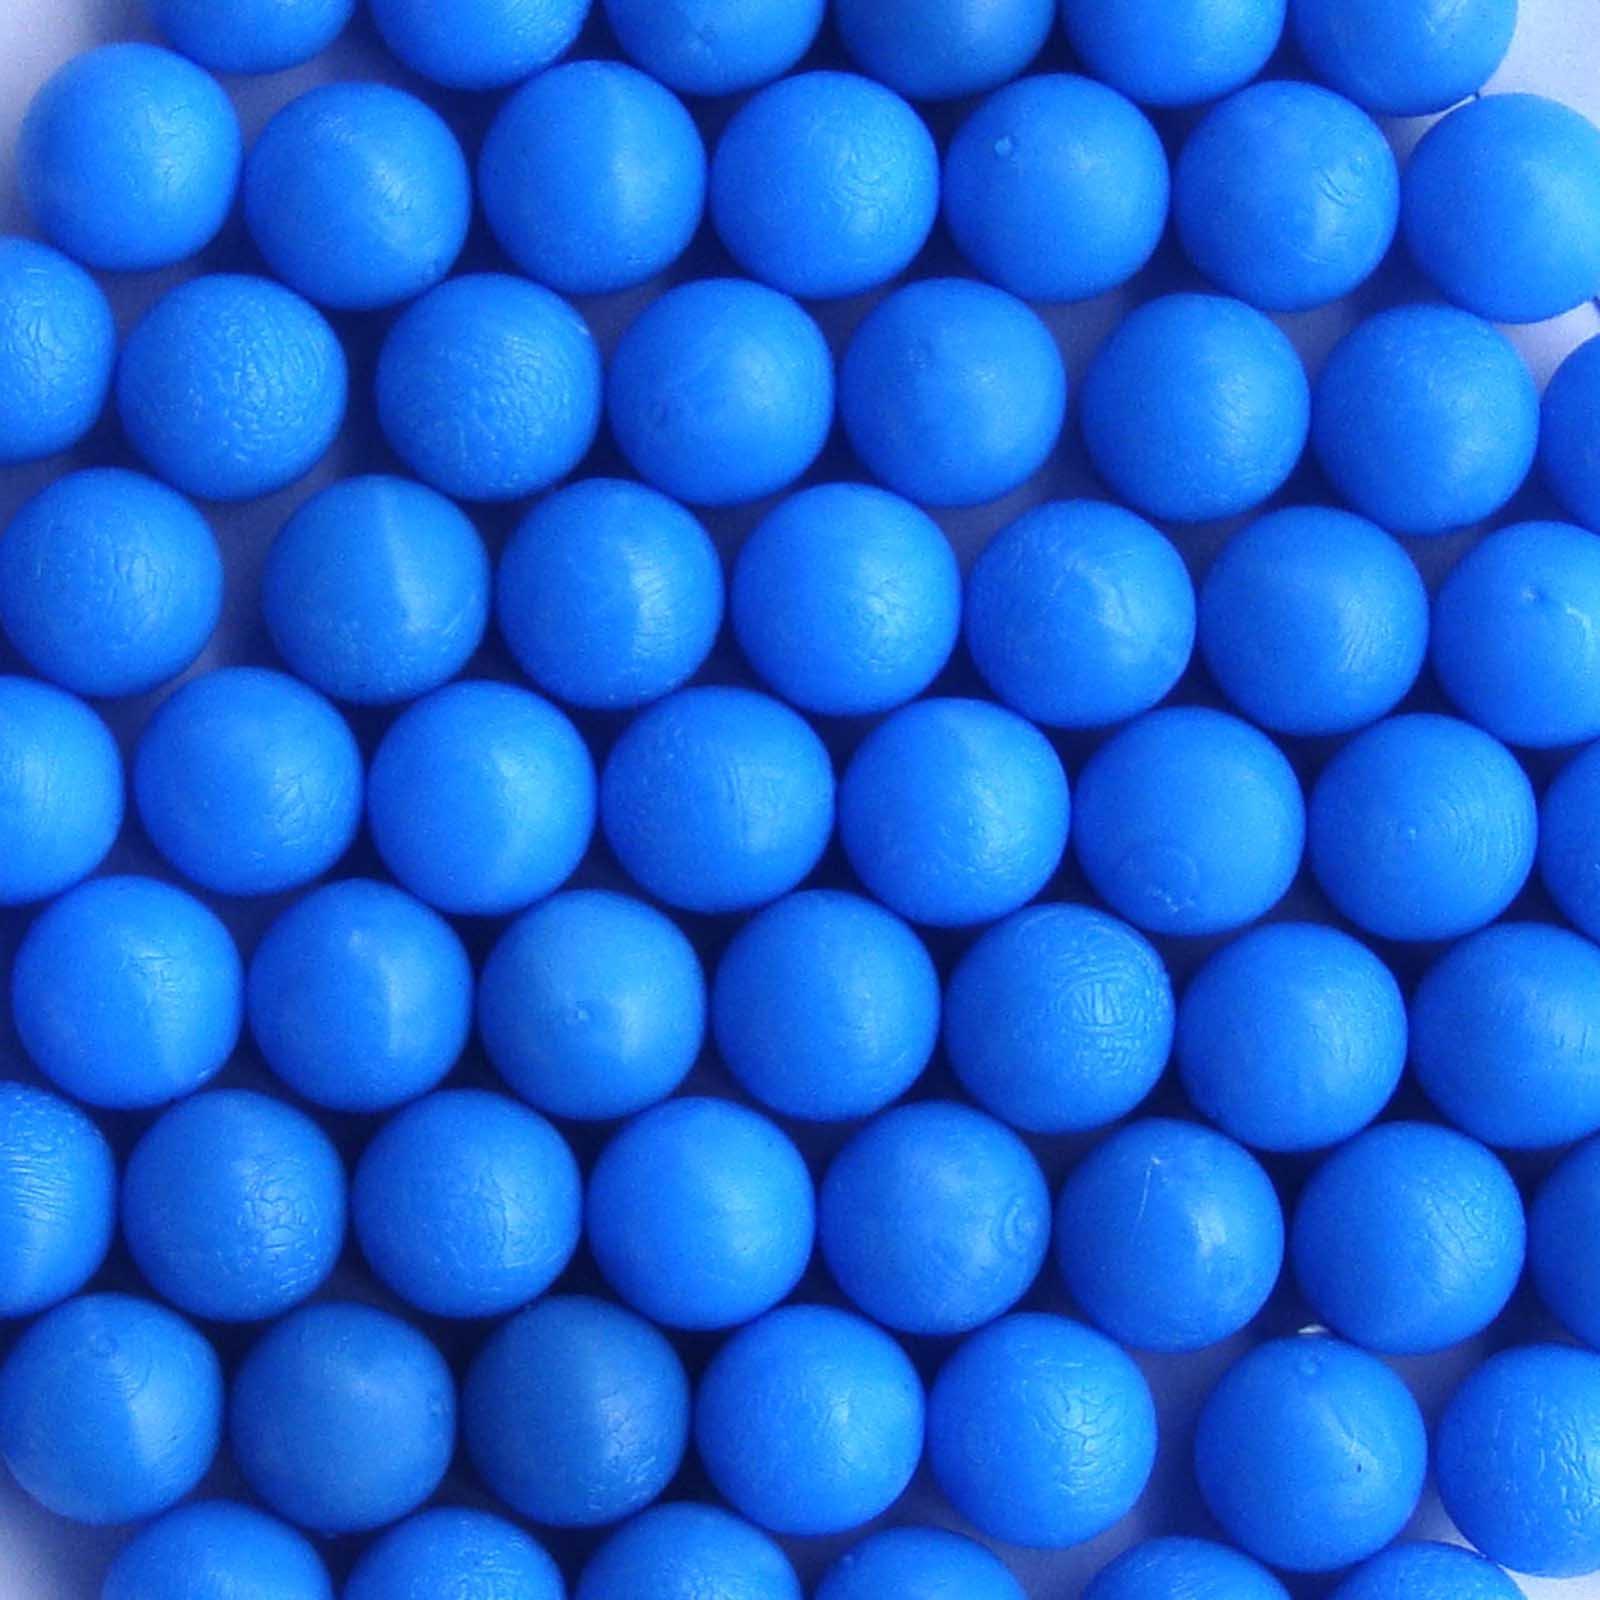 50 New .68 Cal Reusable Rubber Training Balls Paintballs Blue Color